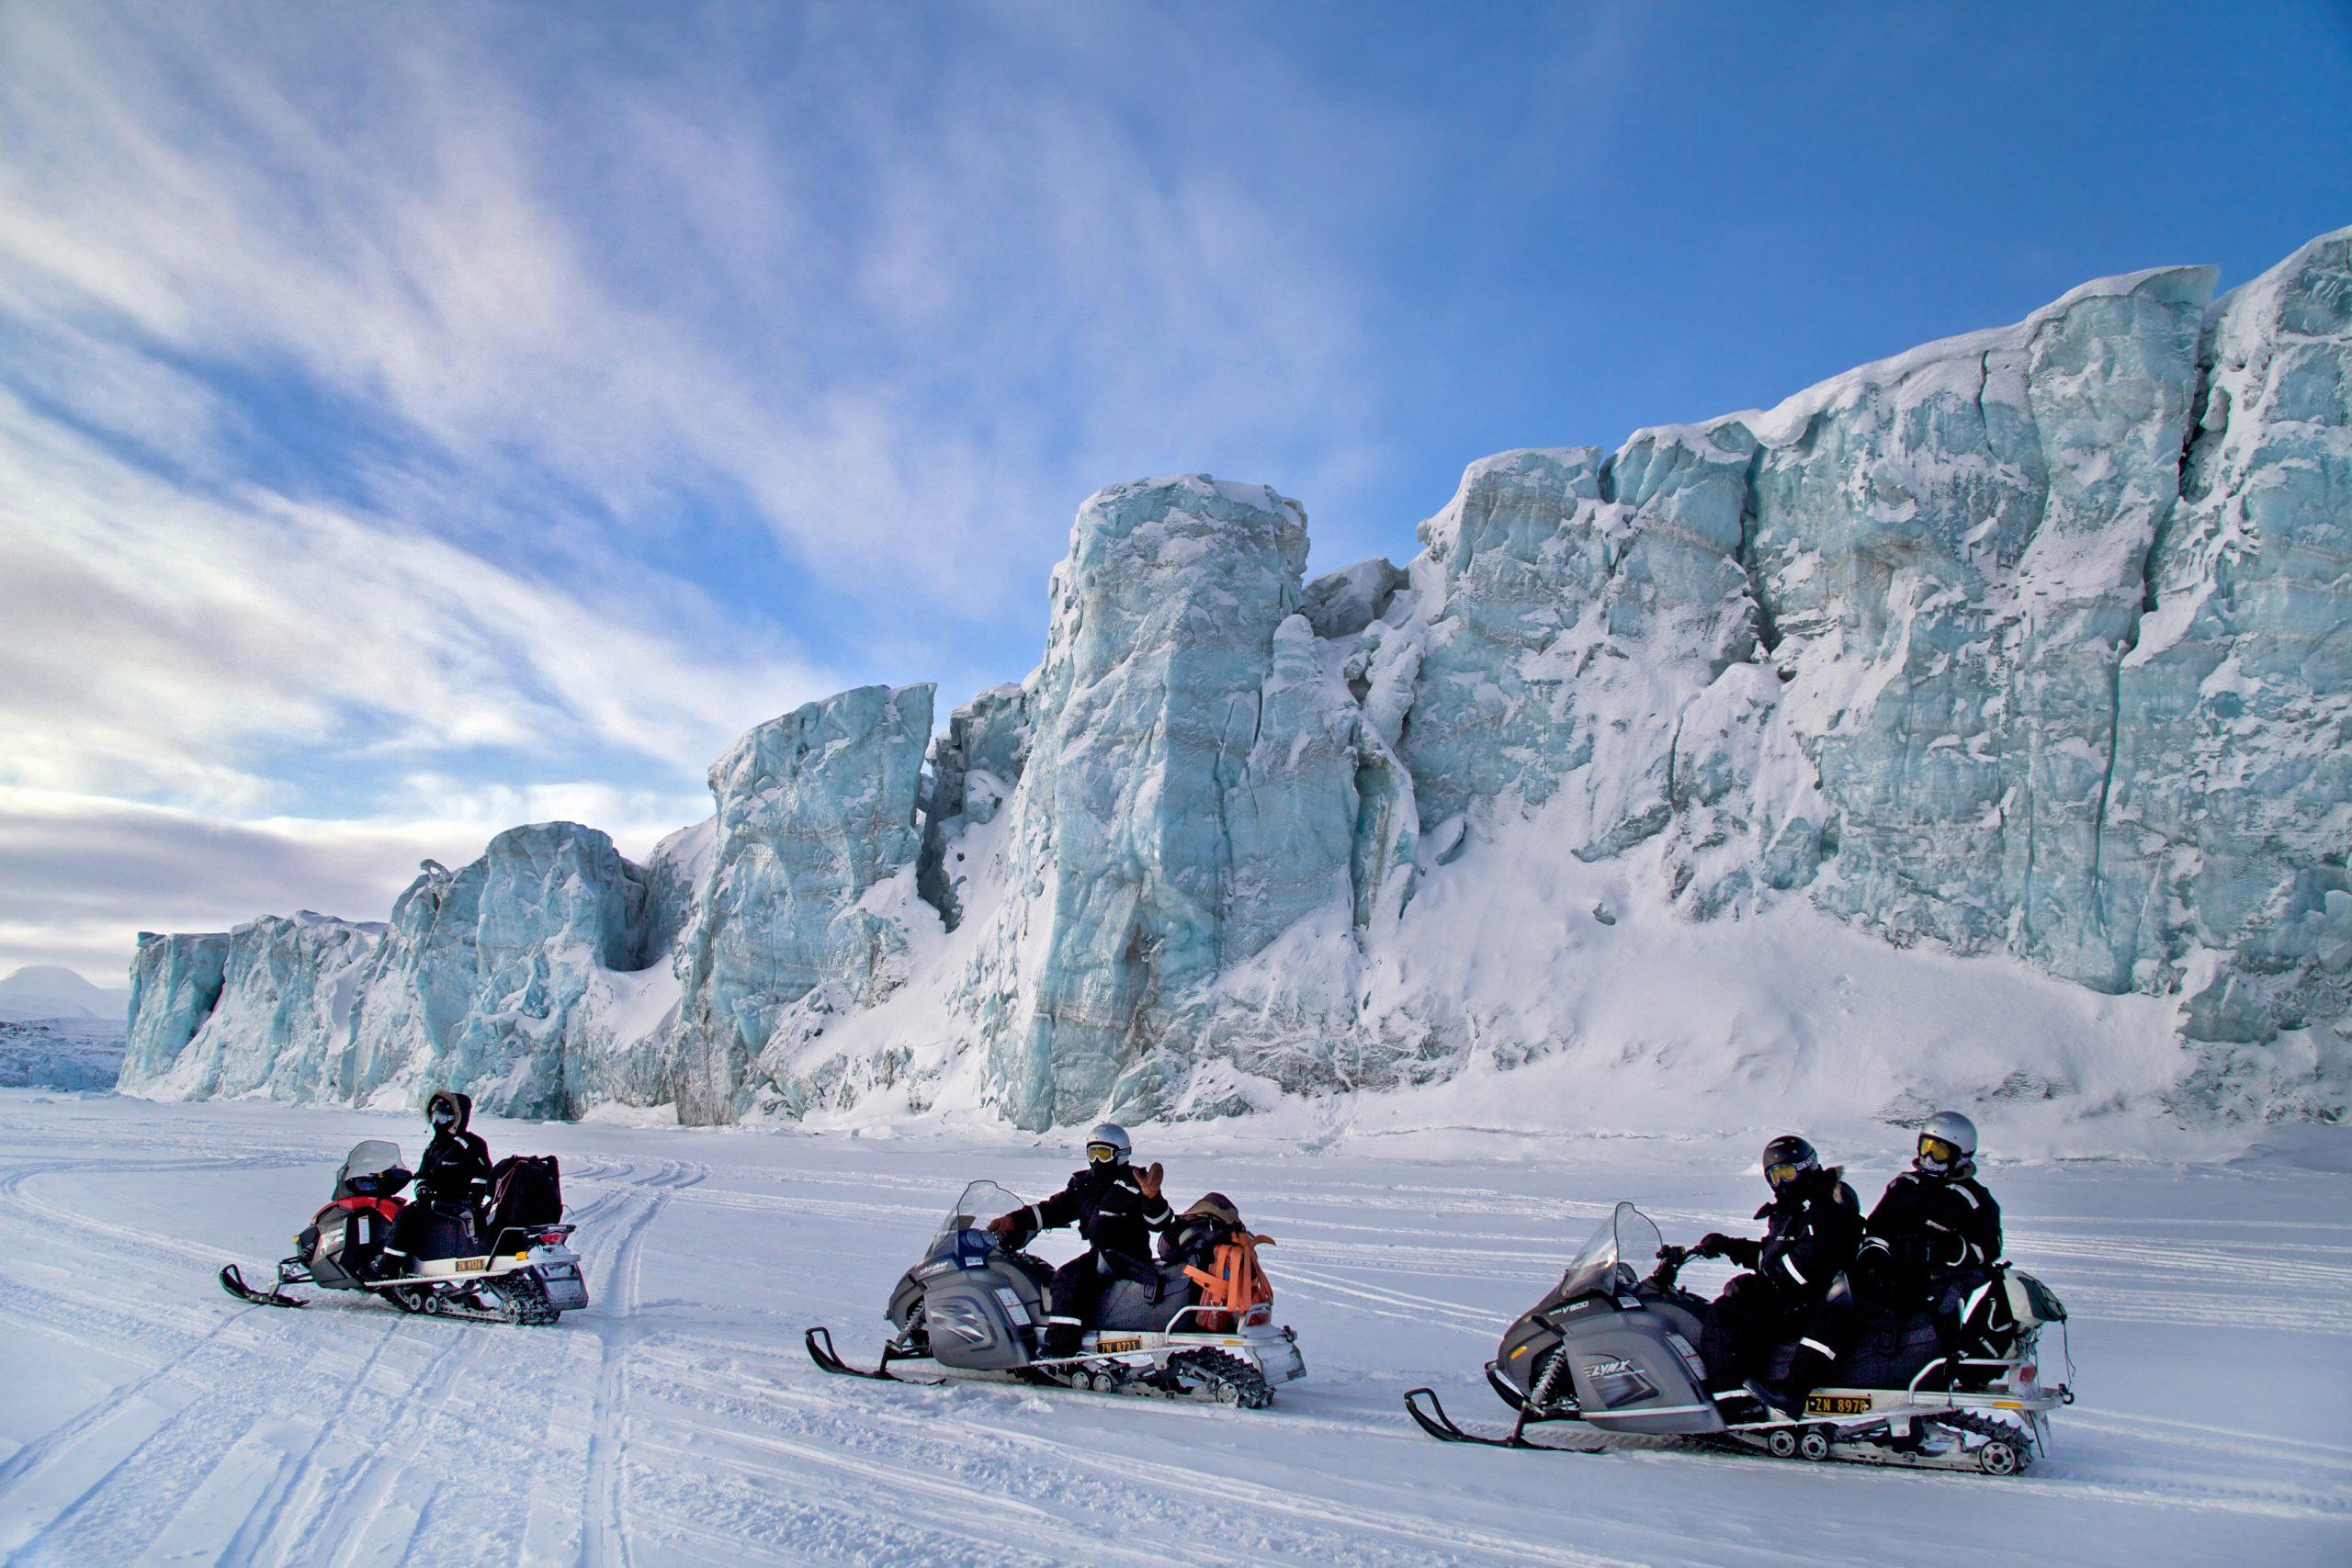 Islas Svalbard - En trineo y motonieve